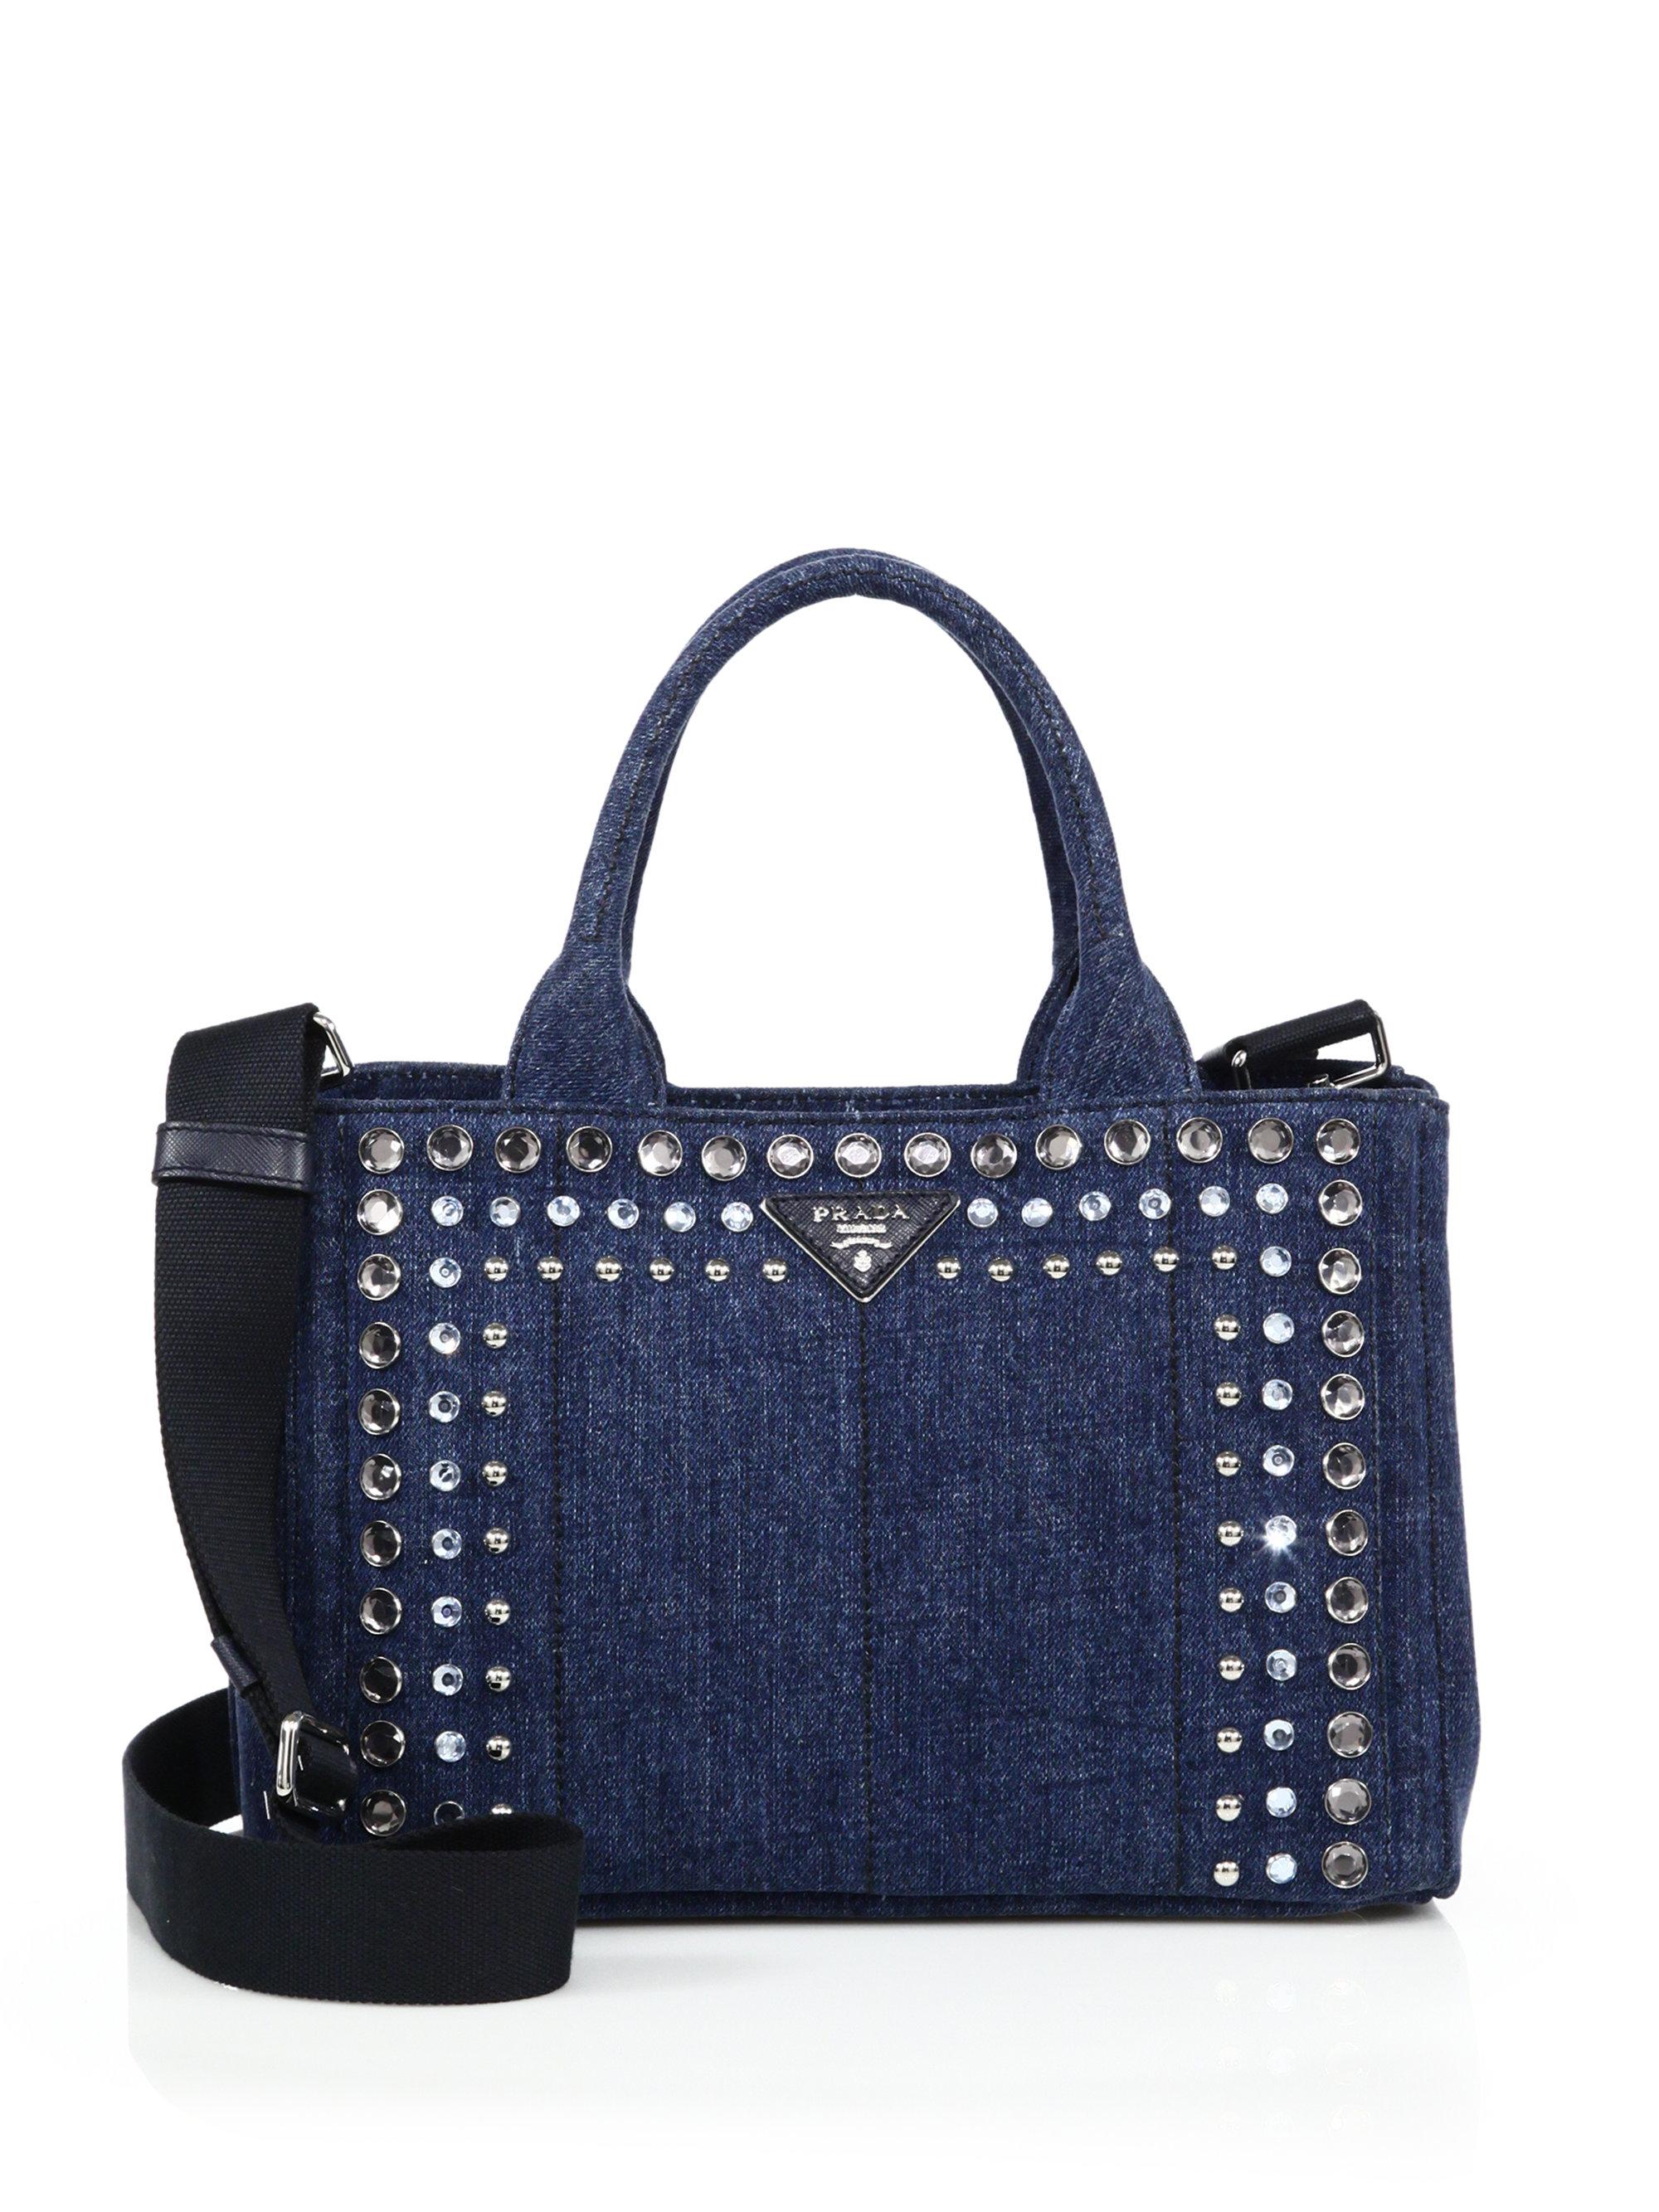 prada tote bags price - Prada Crystal-embellished Denim Tote in Blue (baltico-navy) | Lyst